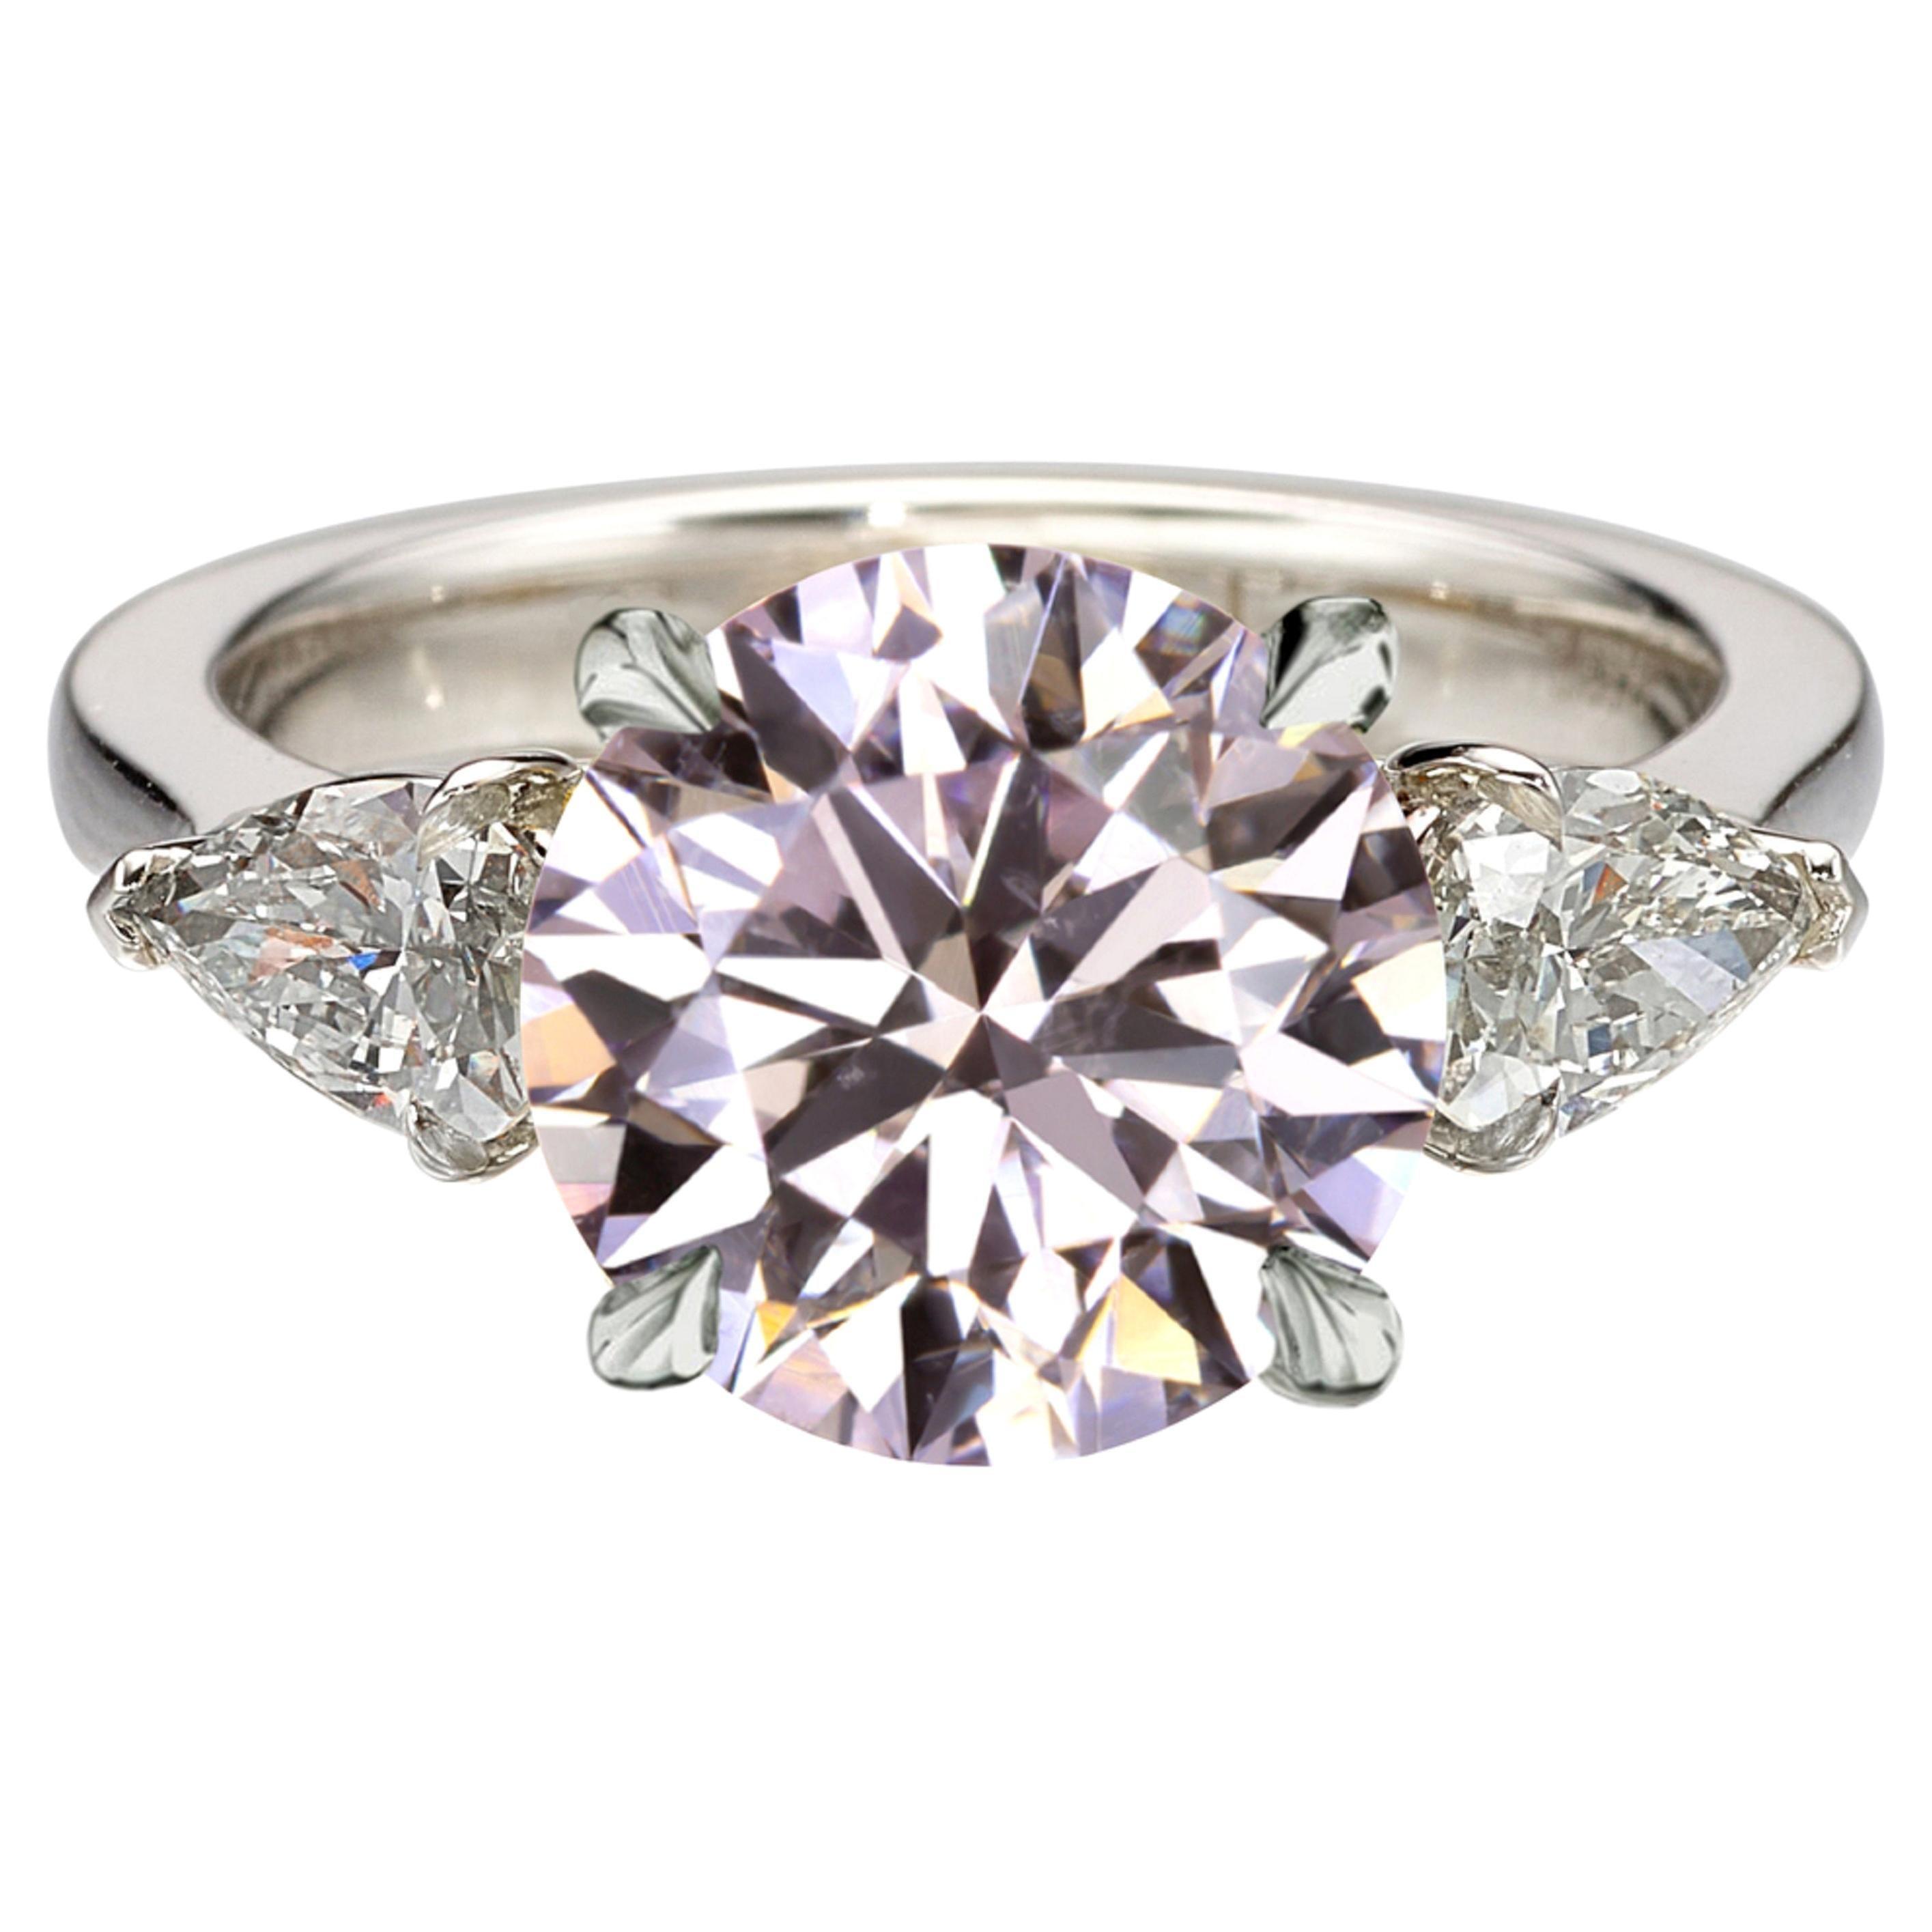 GIA Certified 1.90 Carat Light Pink Round Brilliant Cut Diamond Platinum Ring